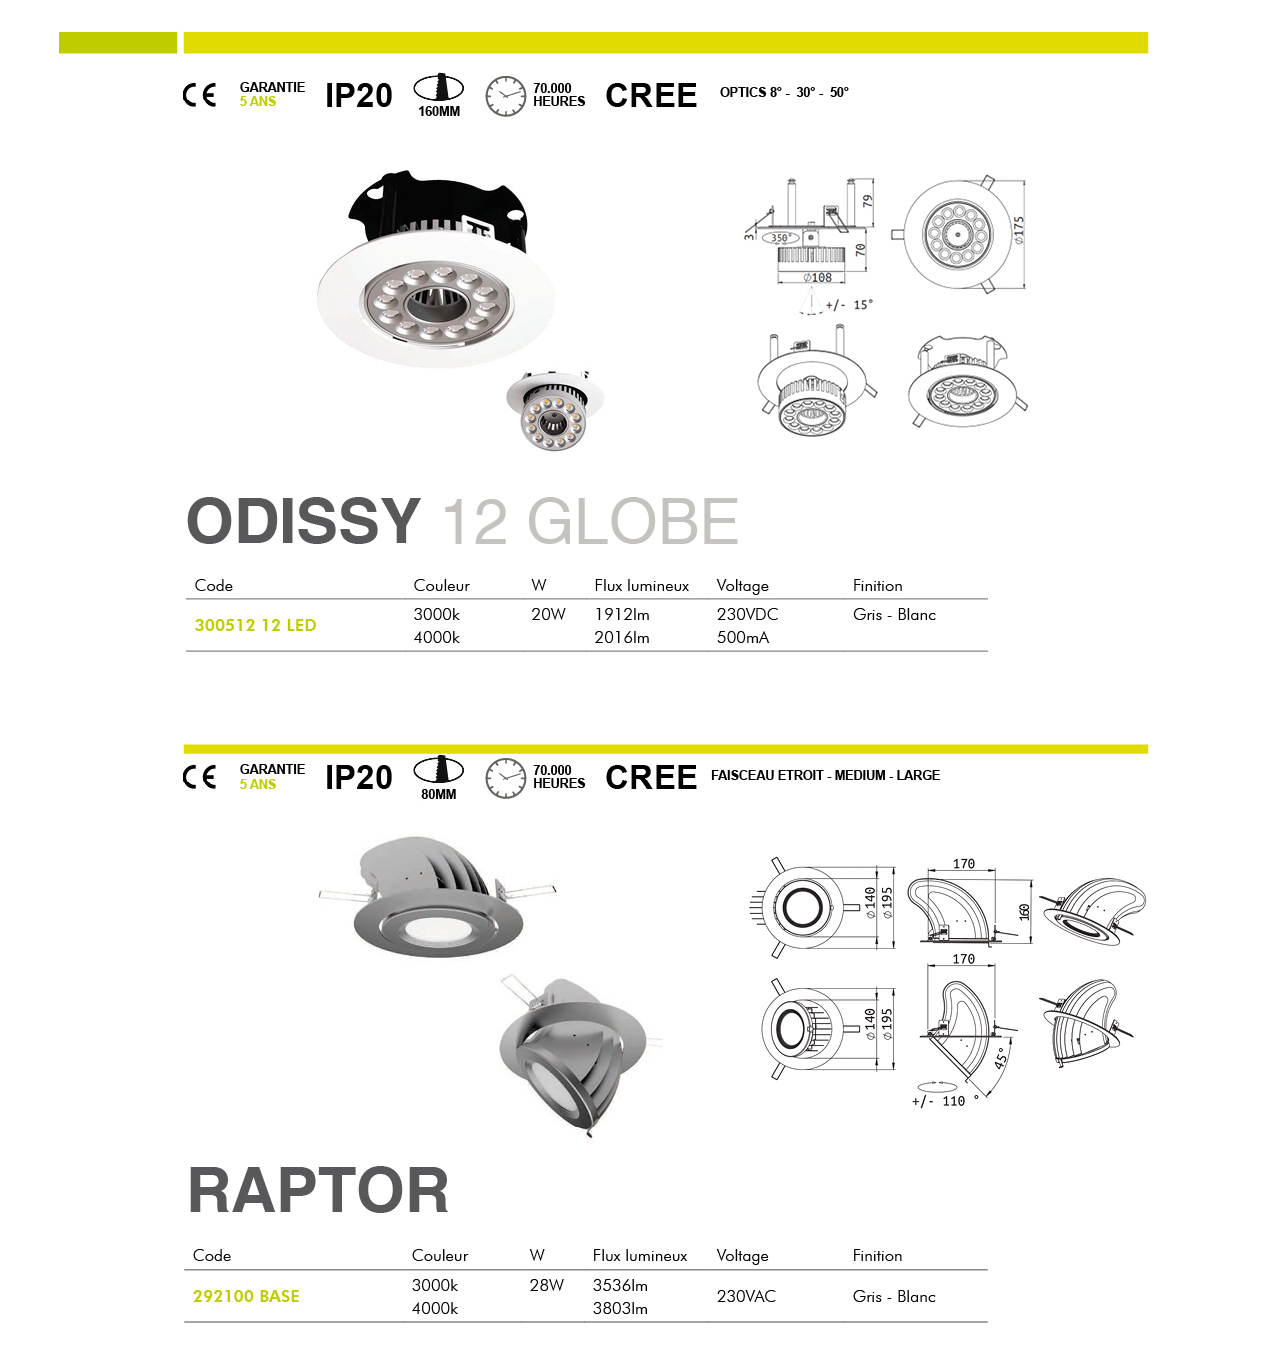 DEF-catalogue-gheury-23-06-201715